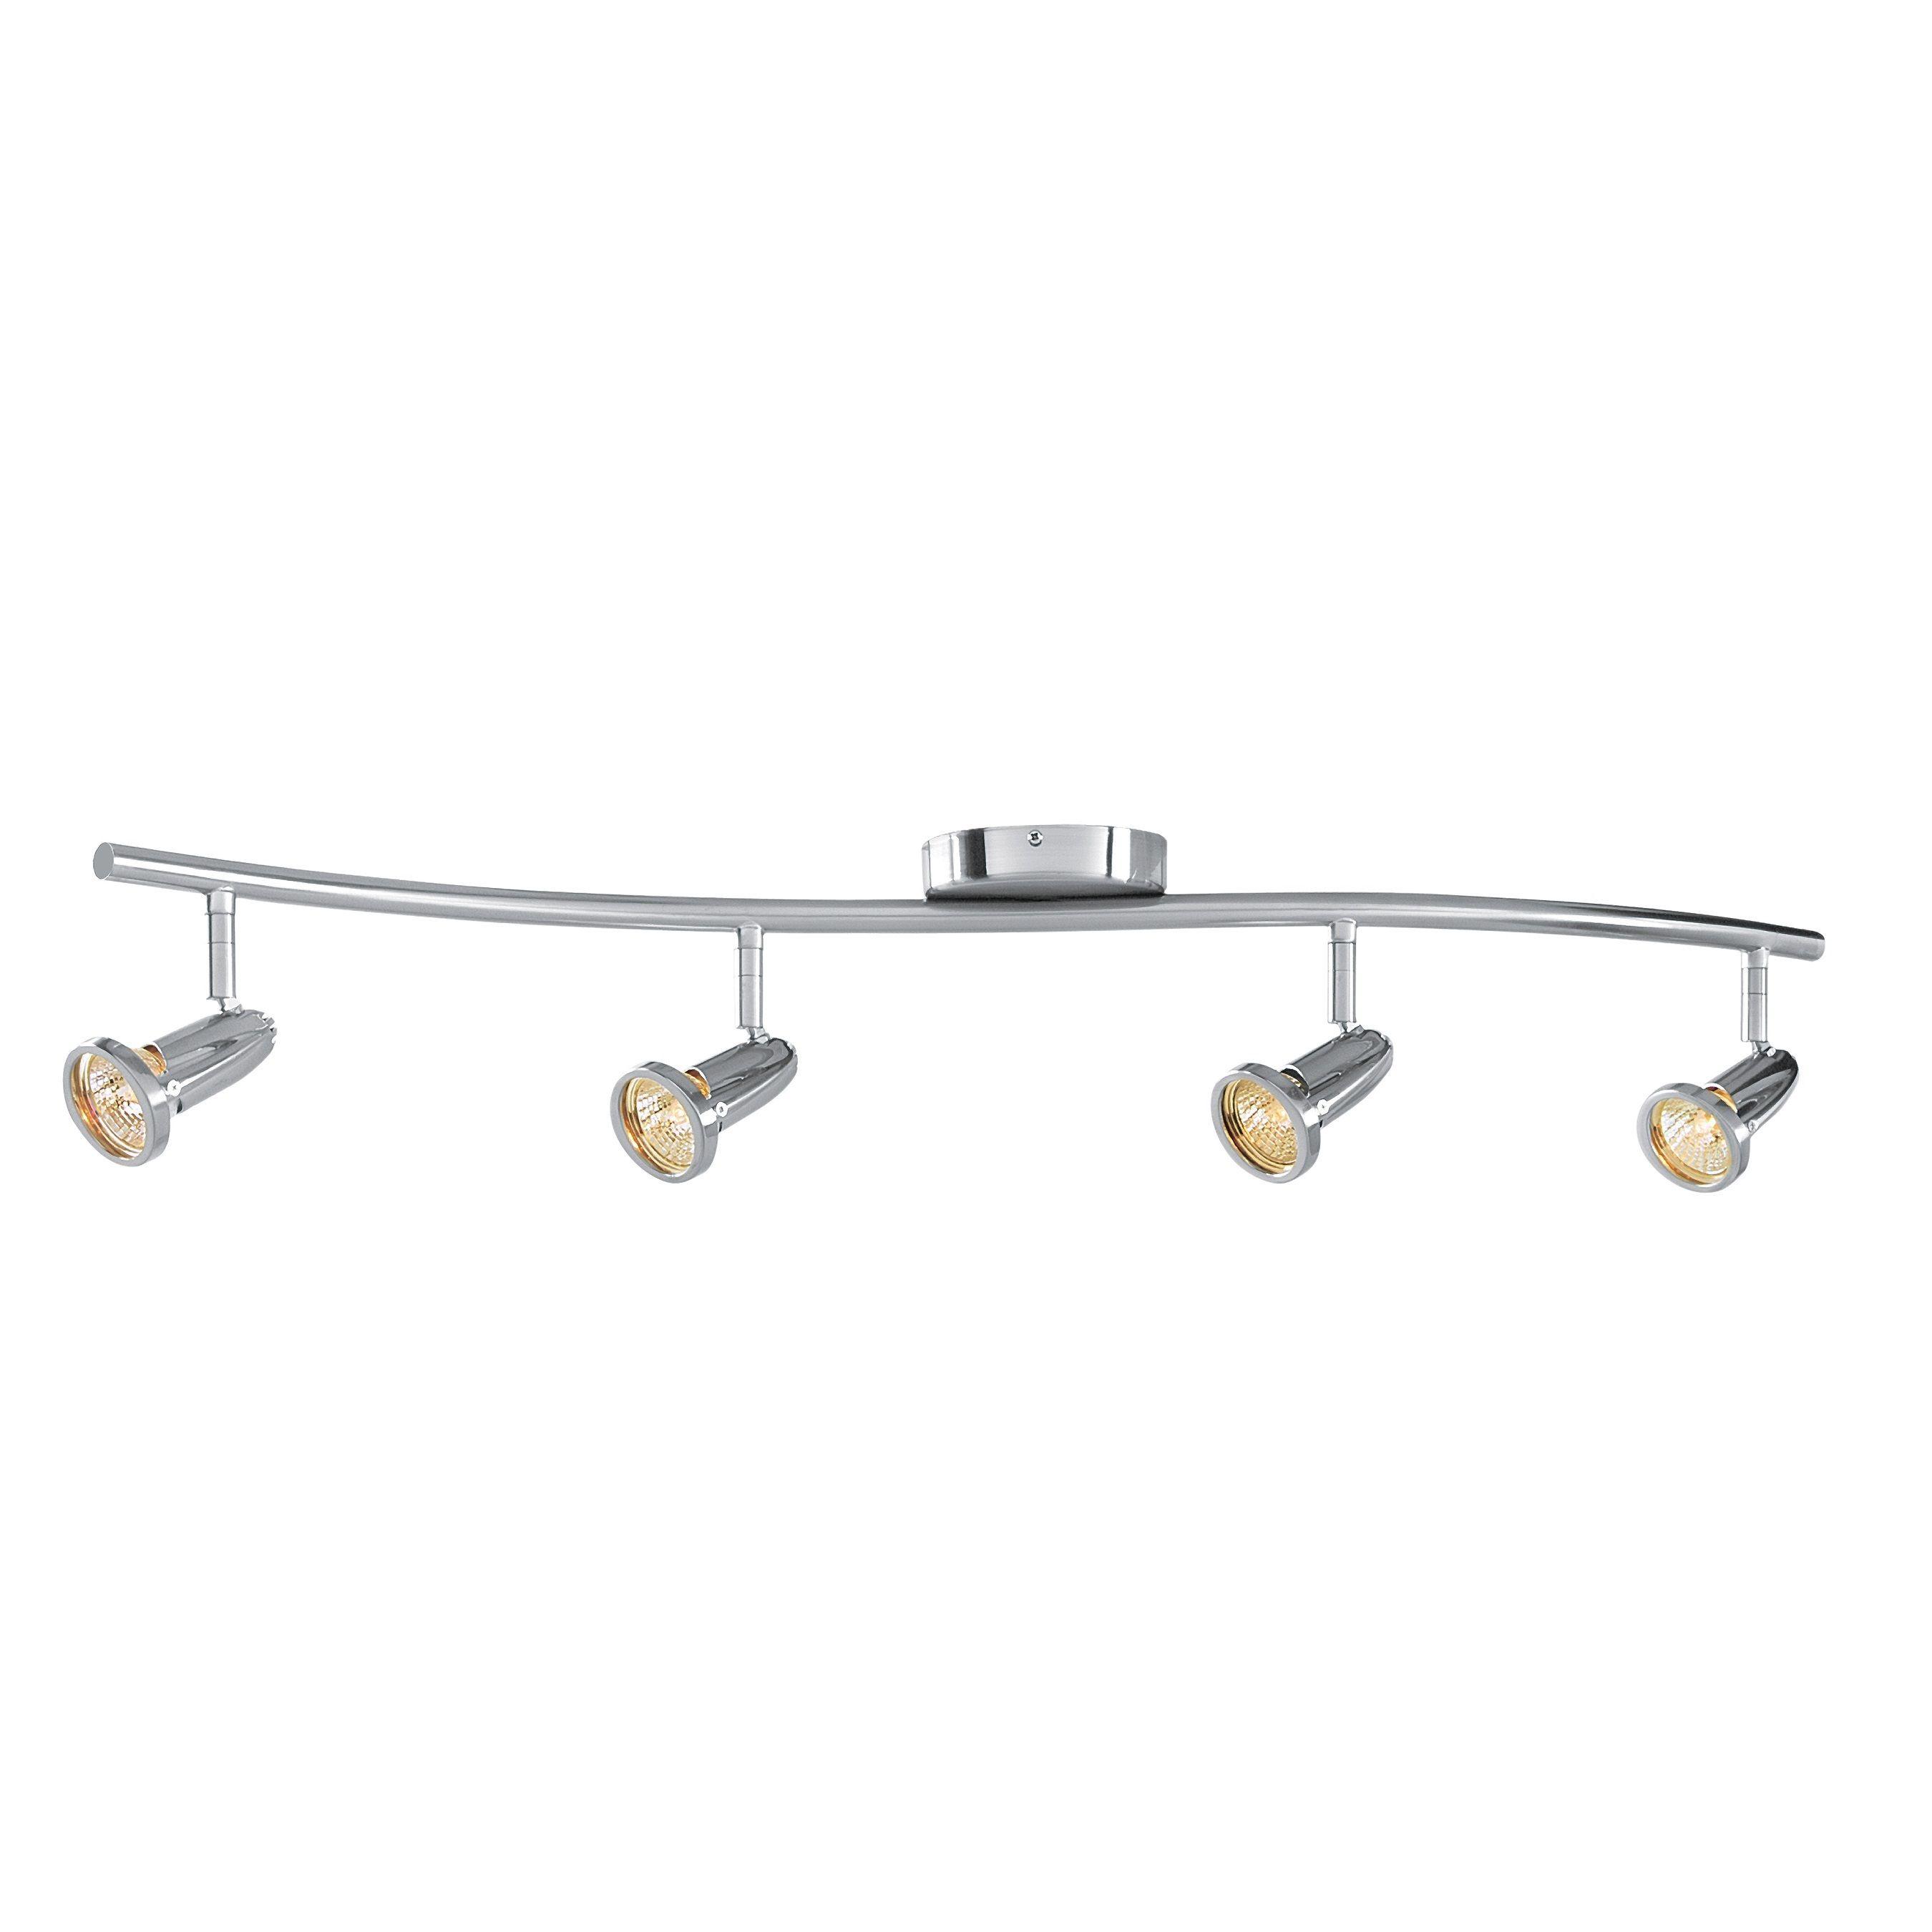 Access Lighting Cobra 4 Light LED Wall/Ceiling Semi-flush Spotlight ...